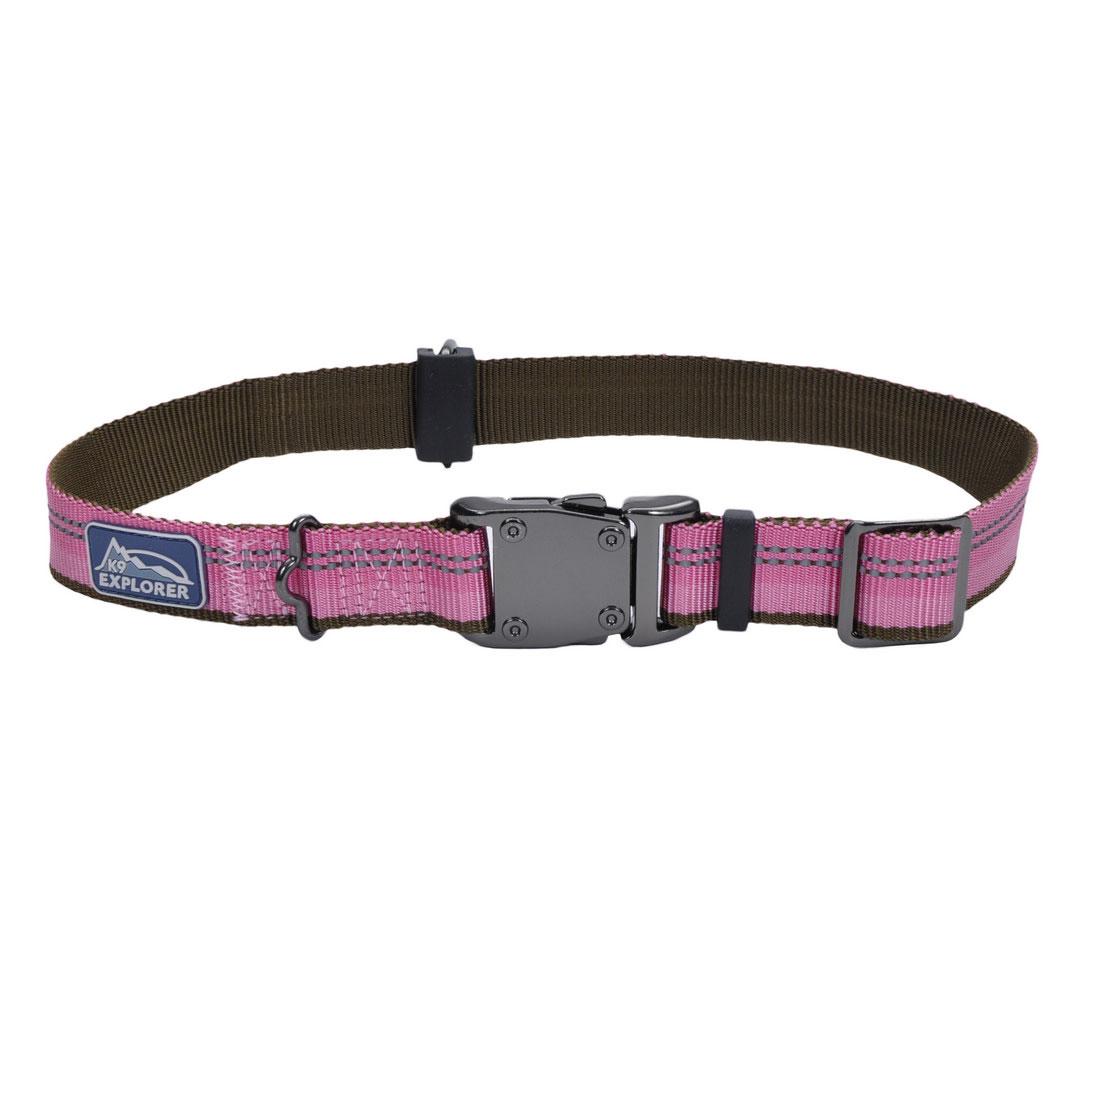 Coastal Pet K9 Explorer Reflective Adjustable Dog Collar, Rosebud, 1-in x 18-26-in